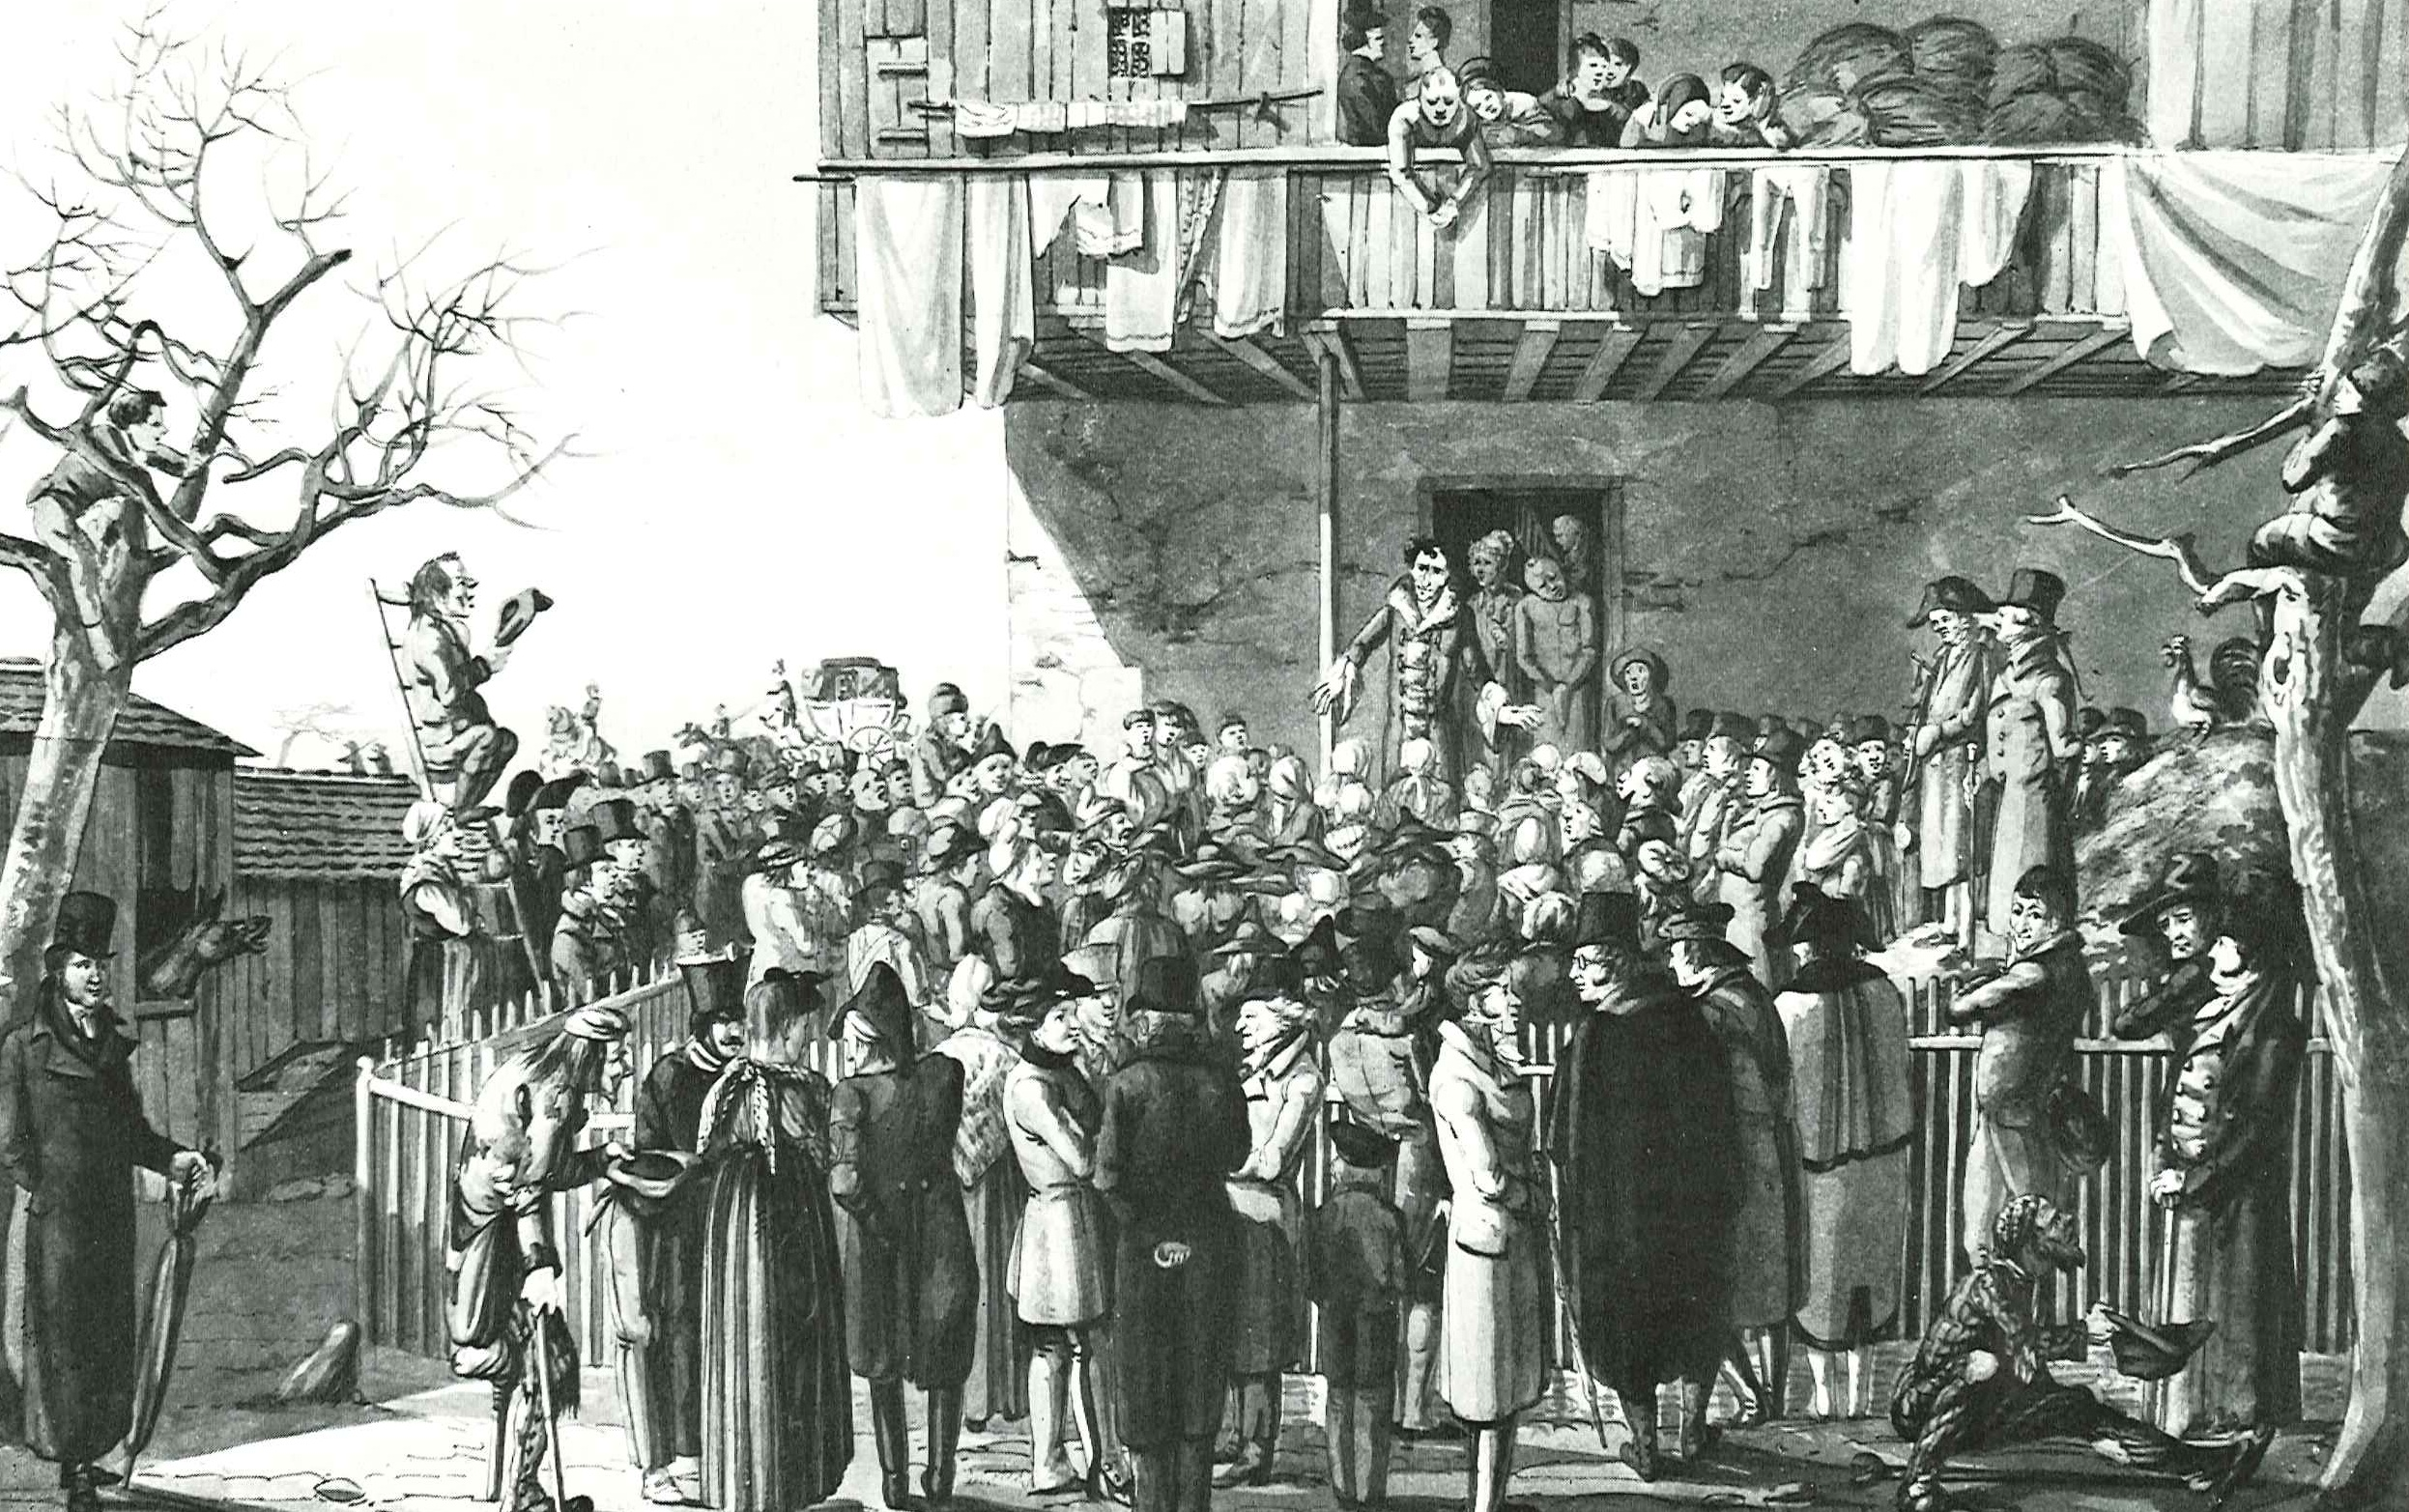 "Aquarela de Hieronymus Hess que descreve multidões saudando a Baronesa de Krüdener (à porta) em Grenzach-Wyhlen, perto de Basileia - <a href=""https://commons.wikimedia.org/wiki/File:Kr%C3%BCdener_Grenzach_1817.jpg"" target=""_blank"" rel=""noopener noreferrer"">Fonte</a>."